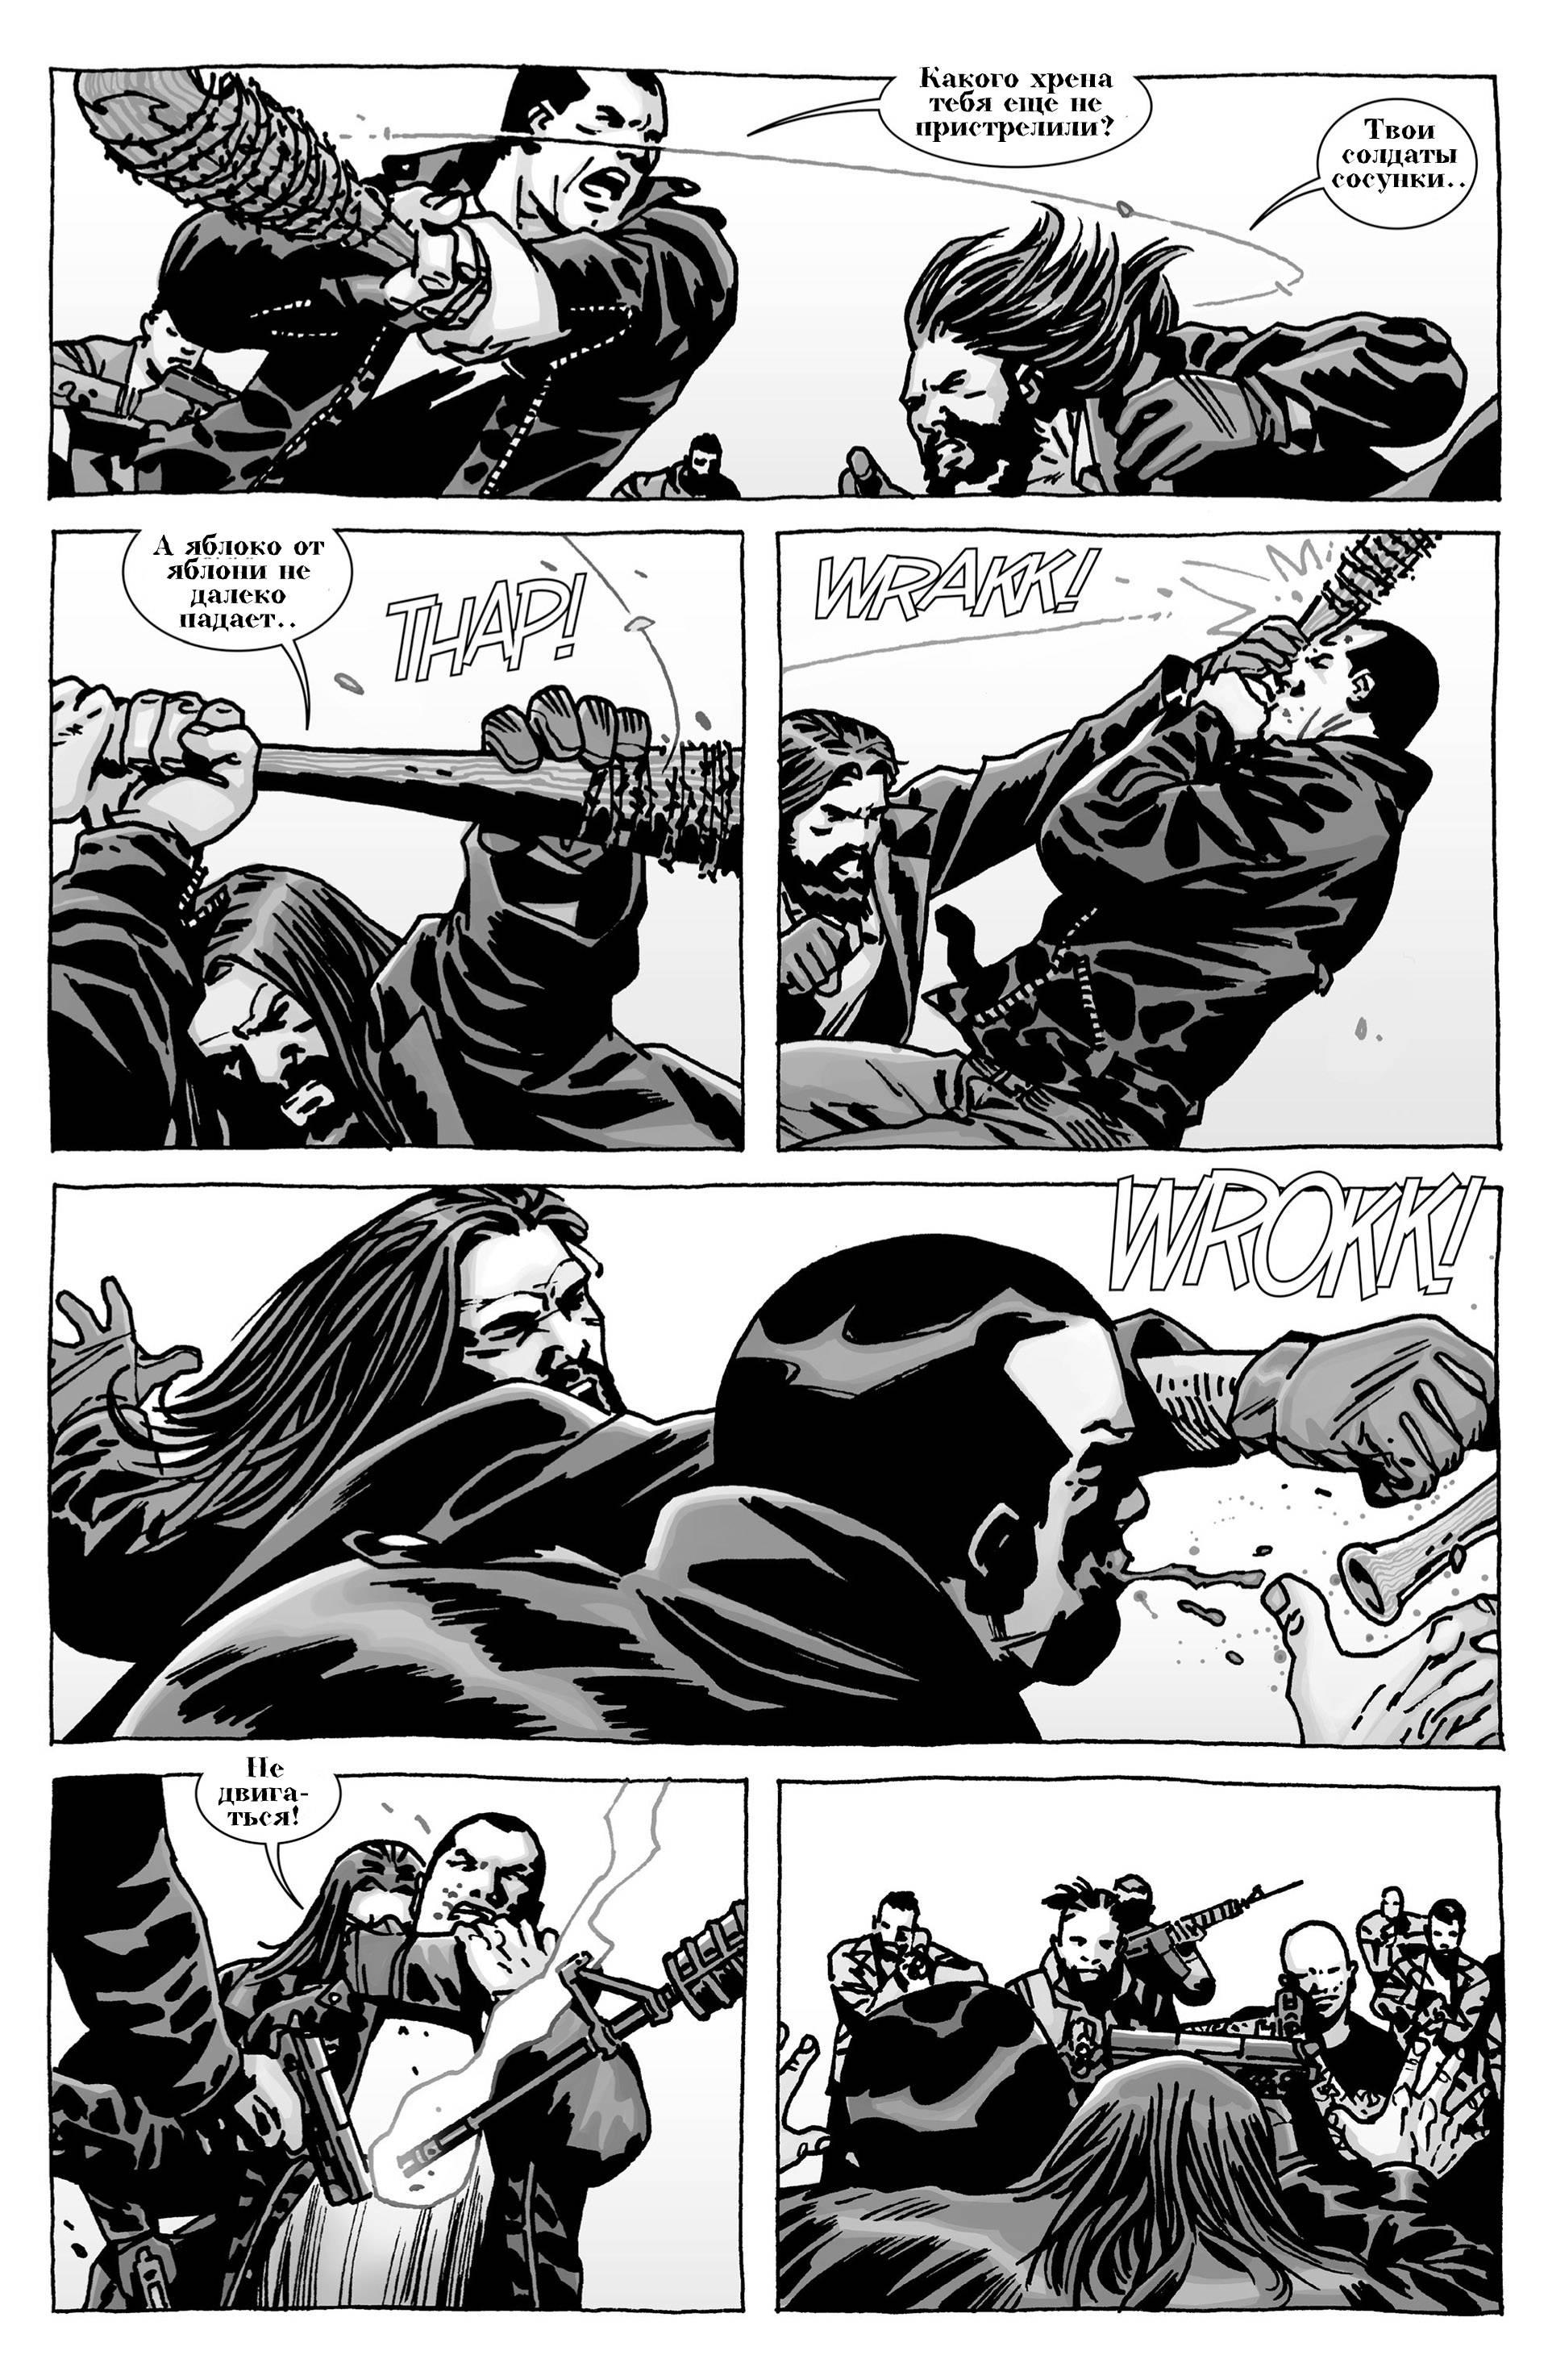 http://img1.unicomics.com/comics/the-walking-dead/the-walking-dead-114/07.jpg